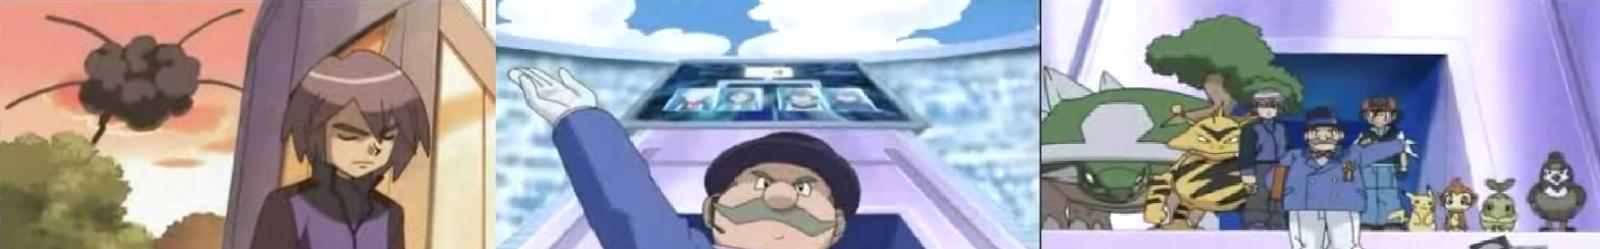 Pokemon Capitulo 51 Temporada 10 Espiritu De Compañerismo